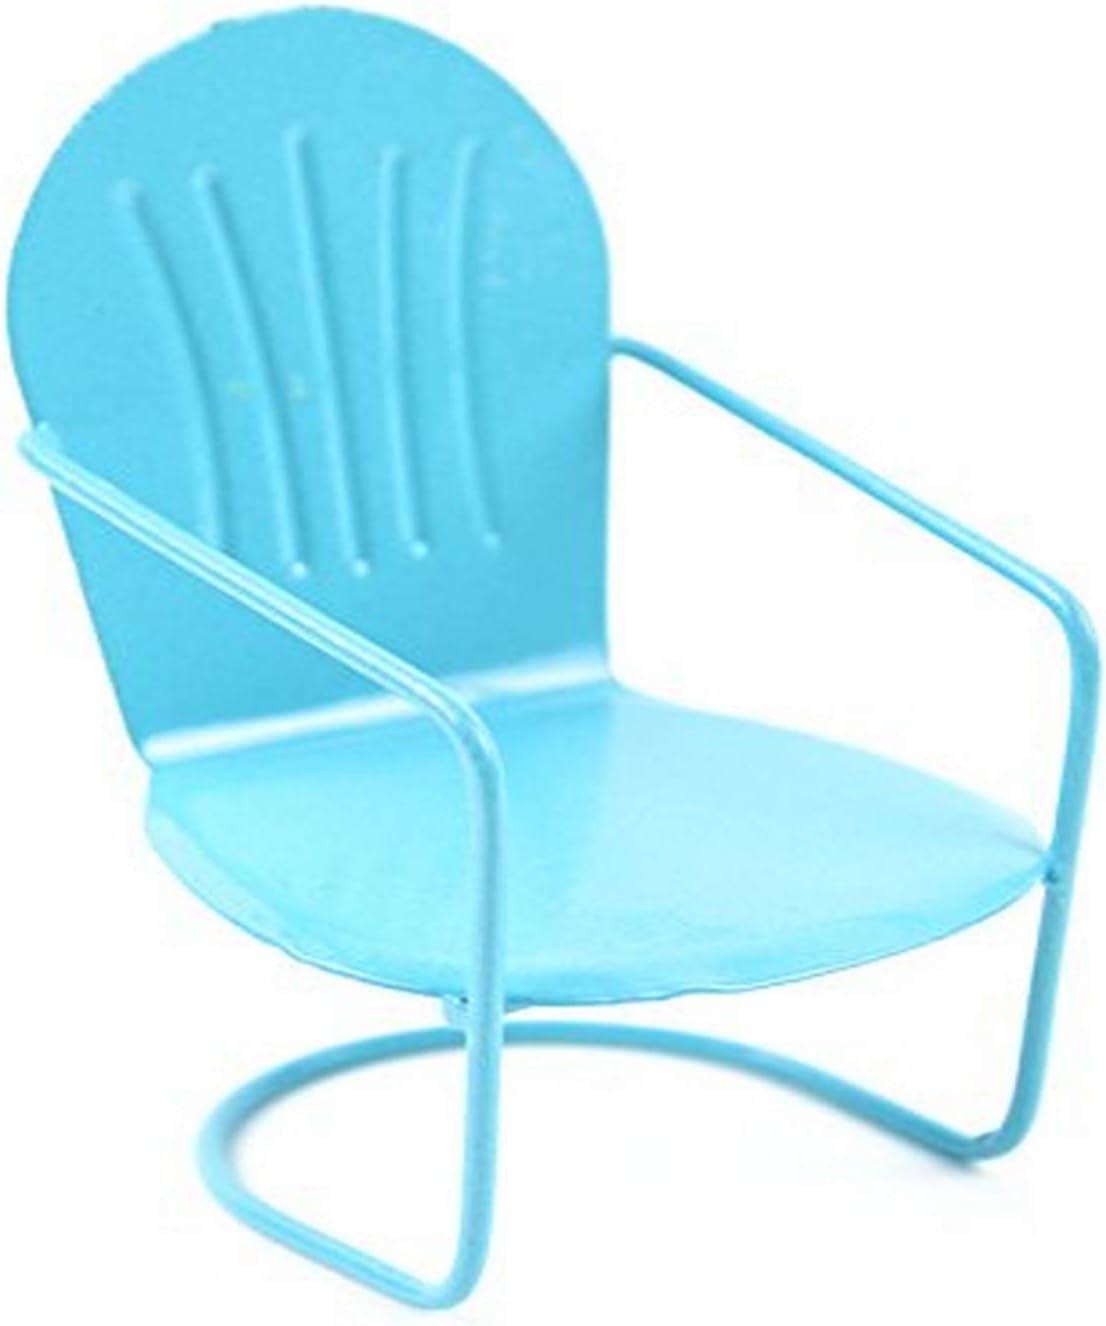 Touch of Nature Miniature Garden Glider Chair, Pastel Blue, 3-Inch